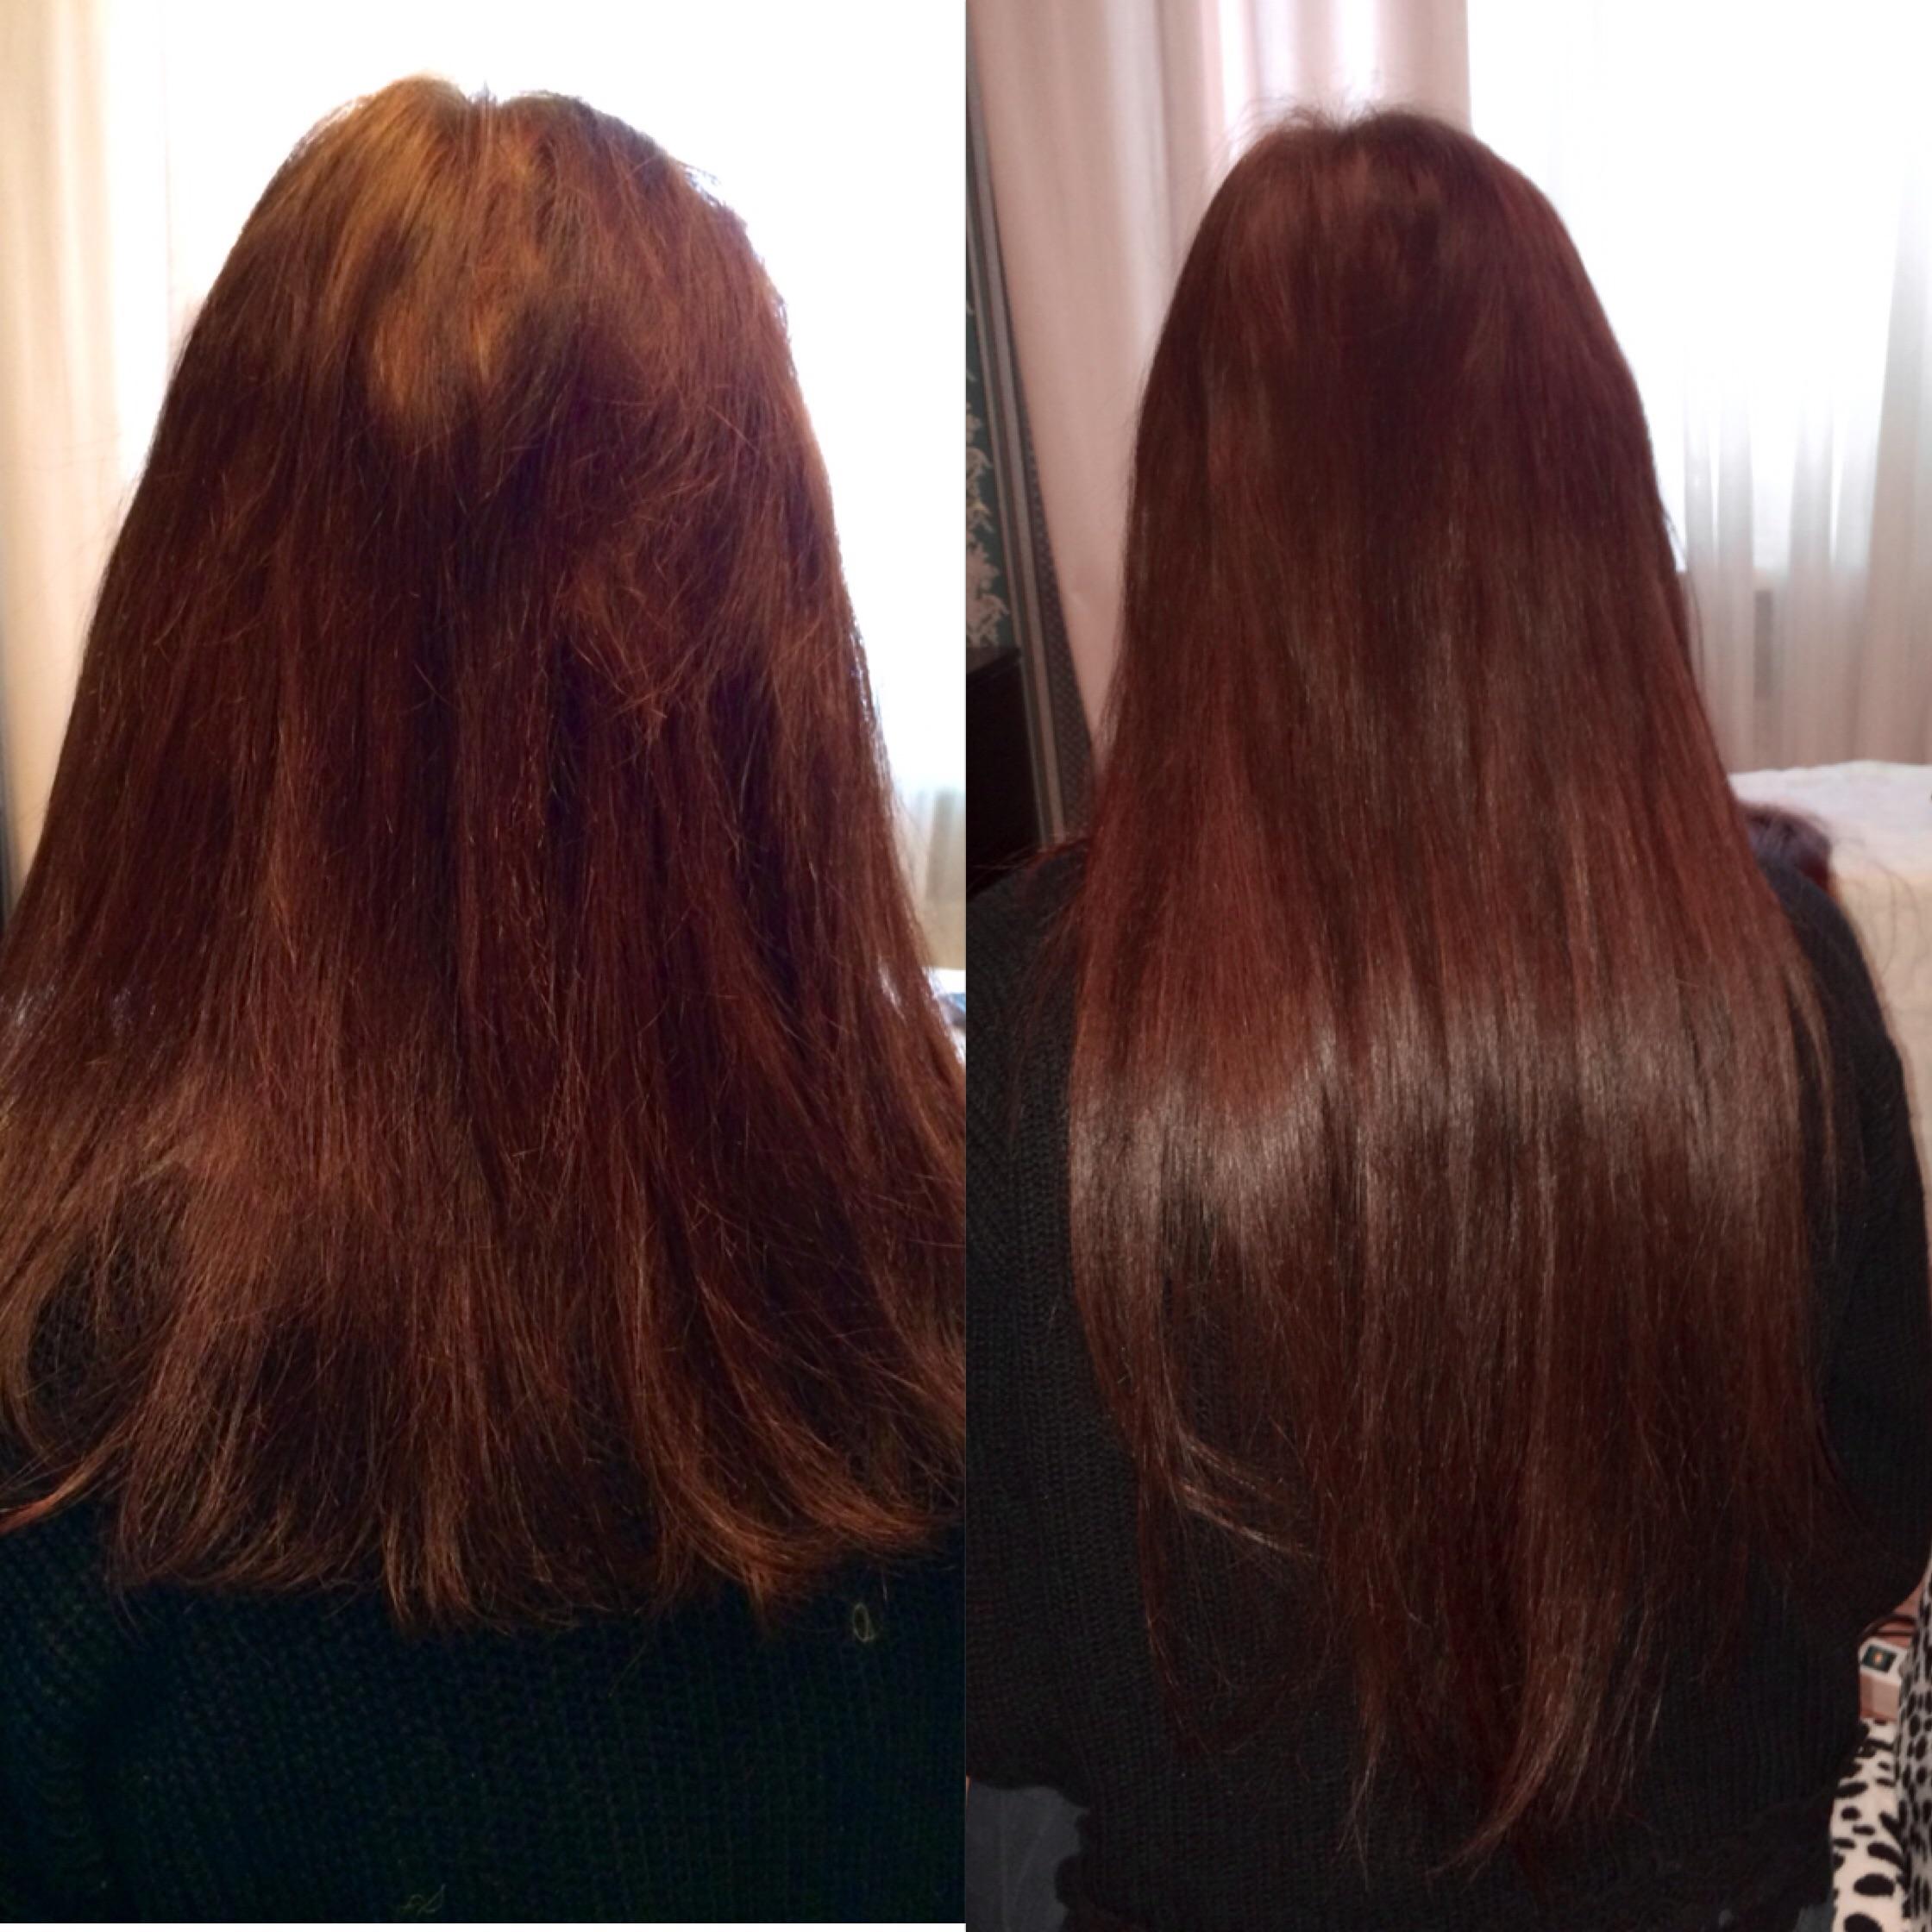 Наращивание волос до после!